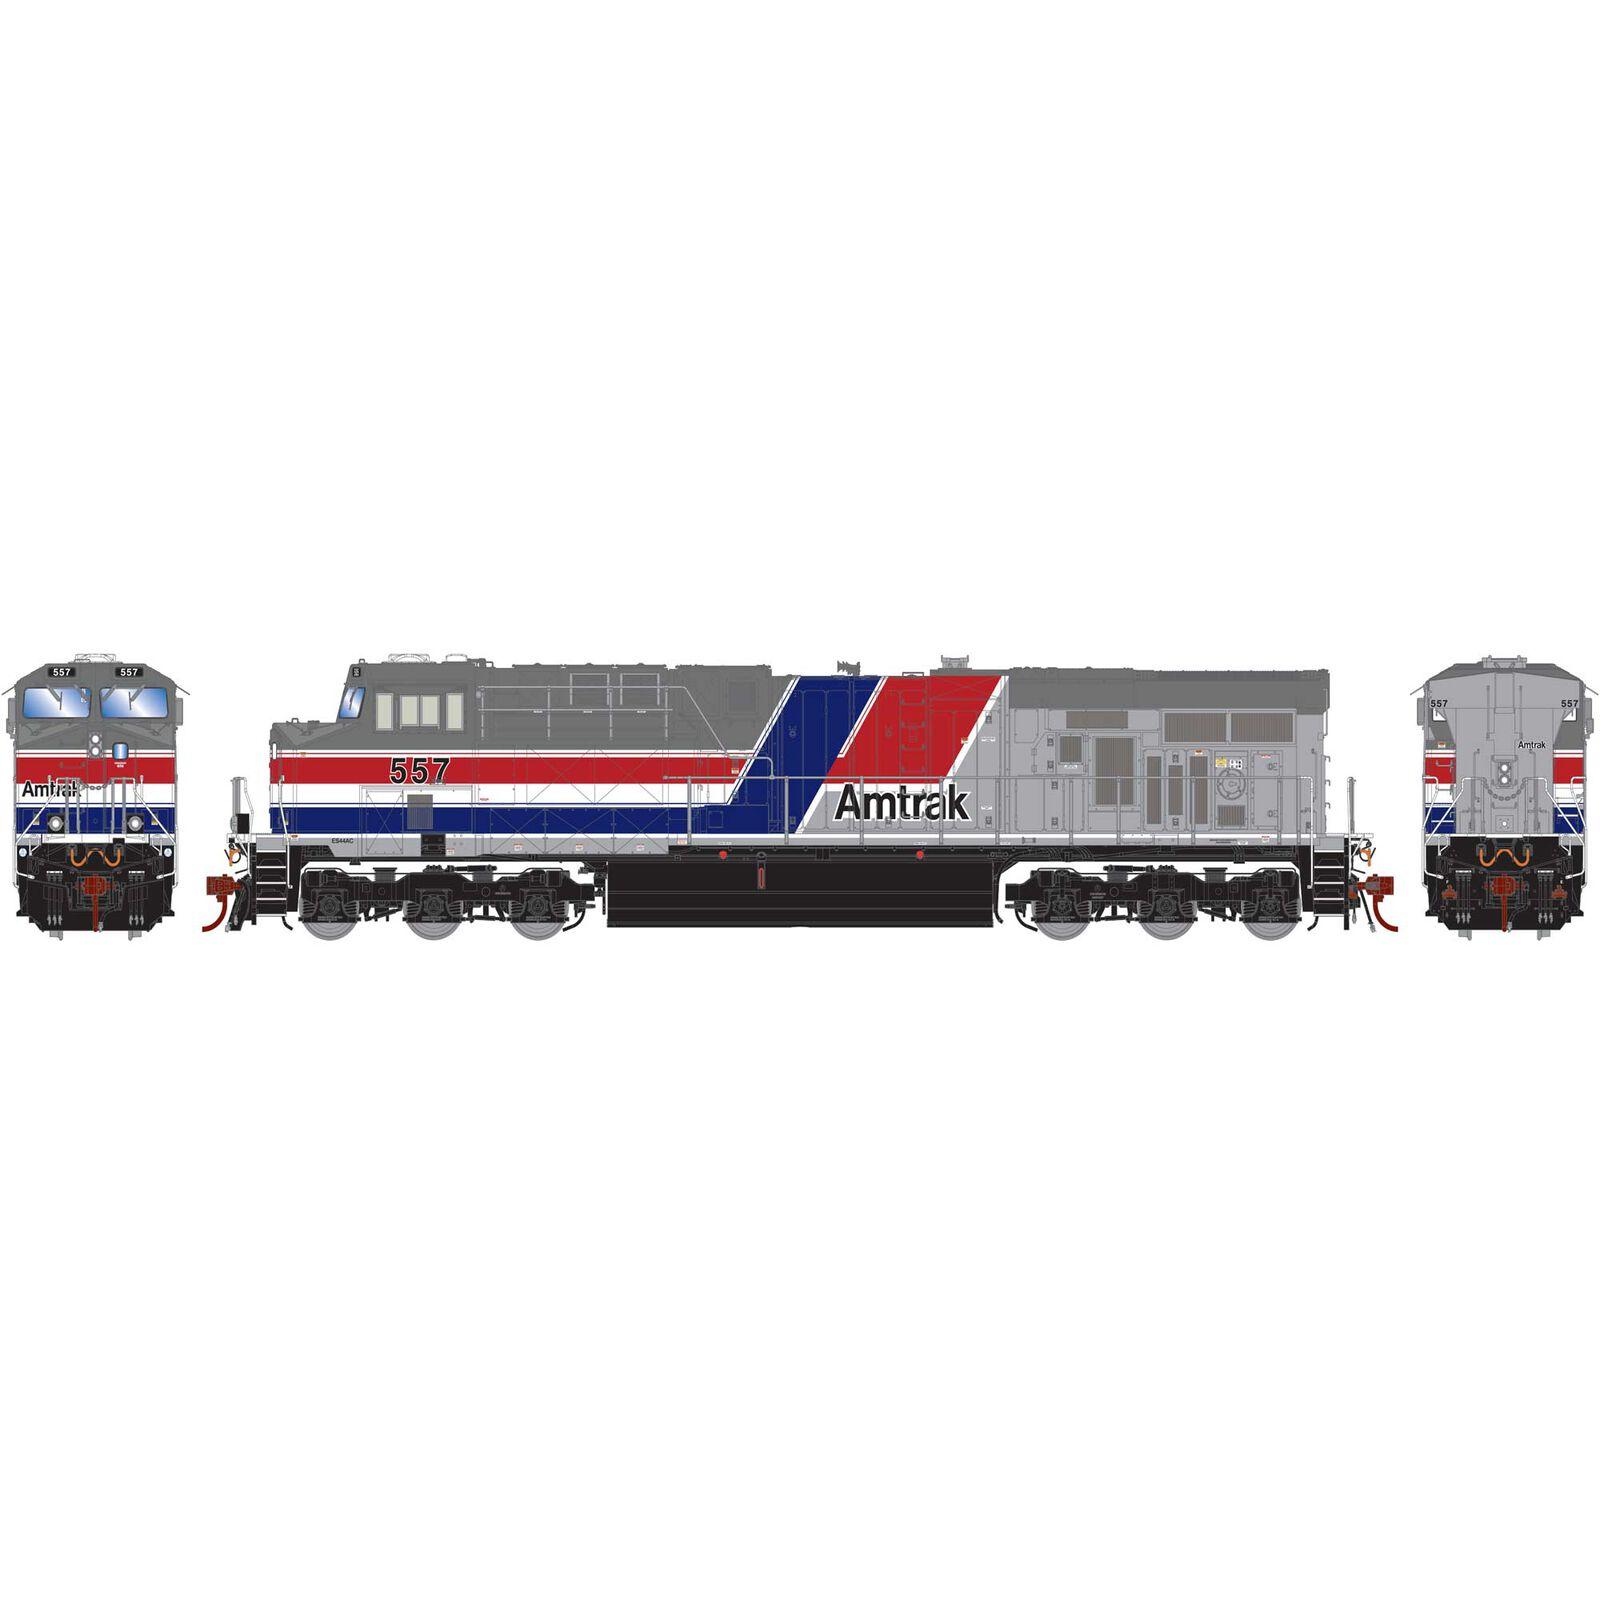 HO ES44AC with DCC & Sound Amtrak #557